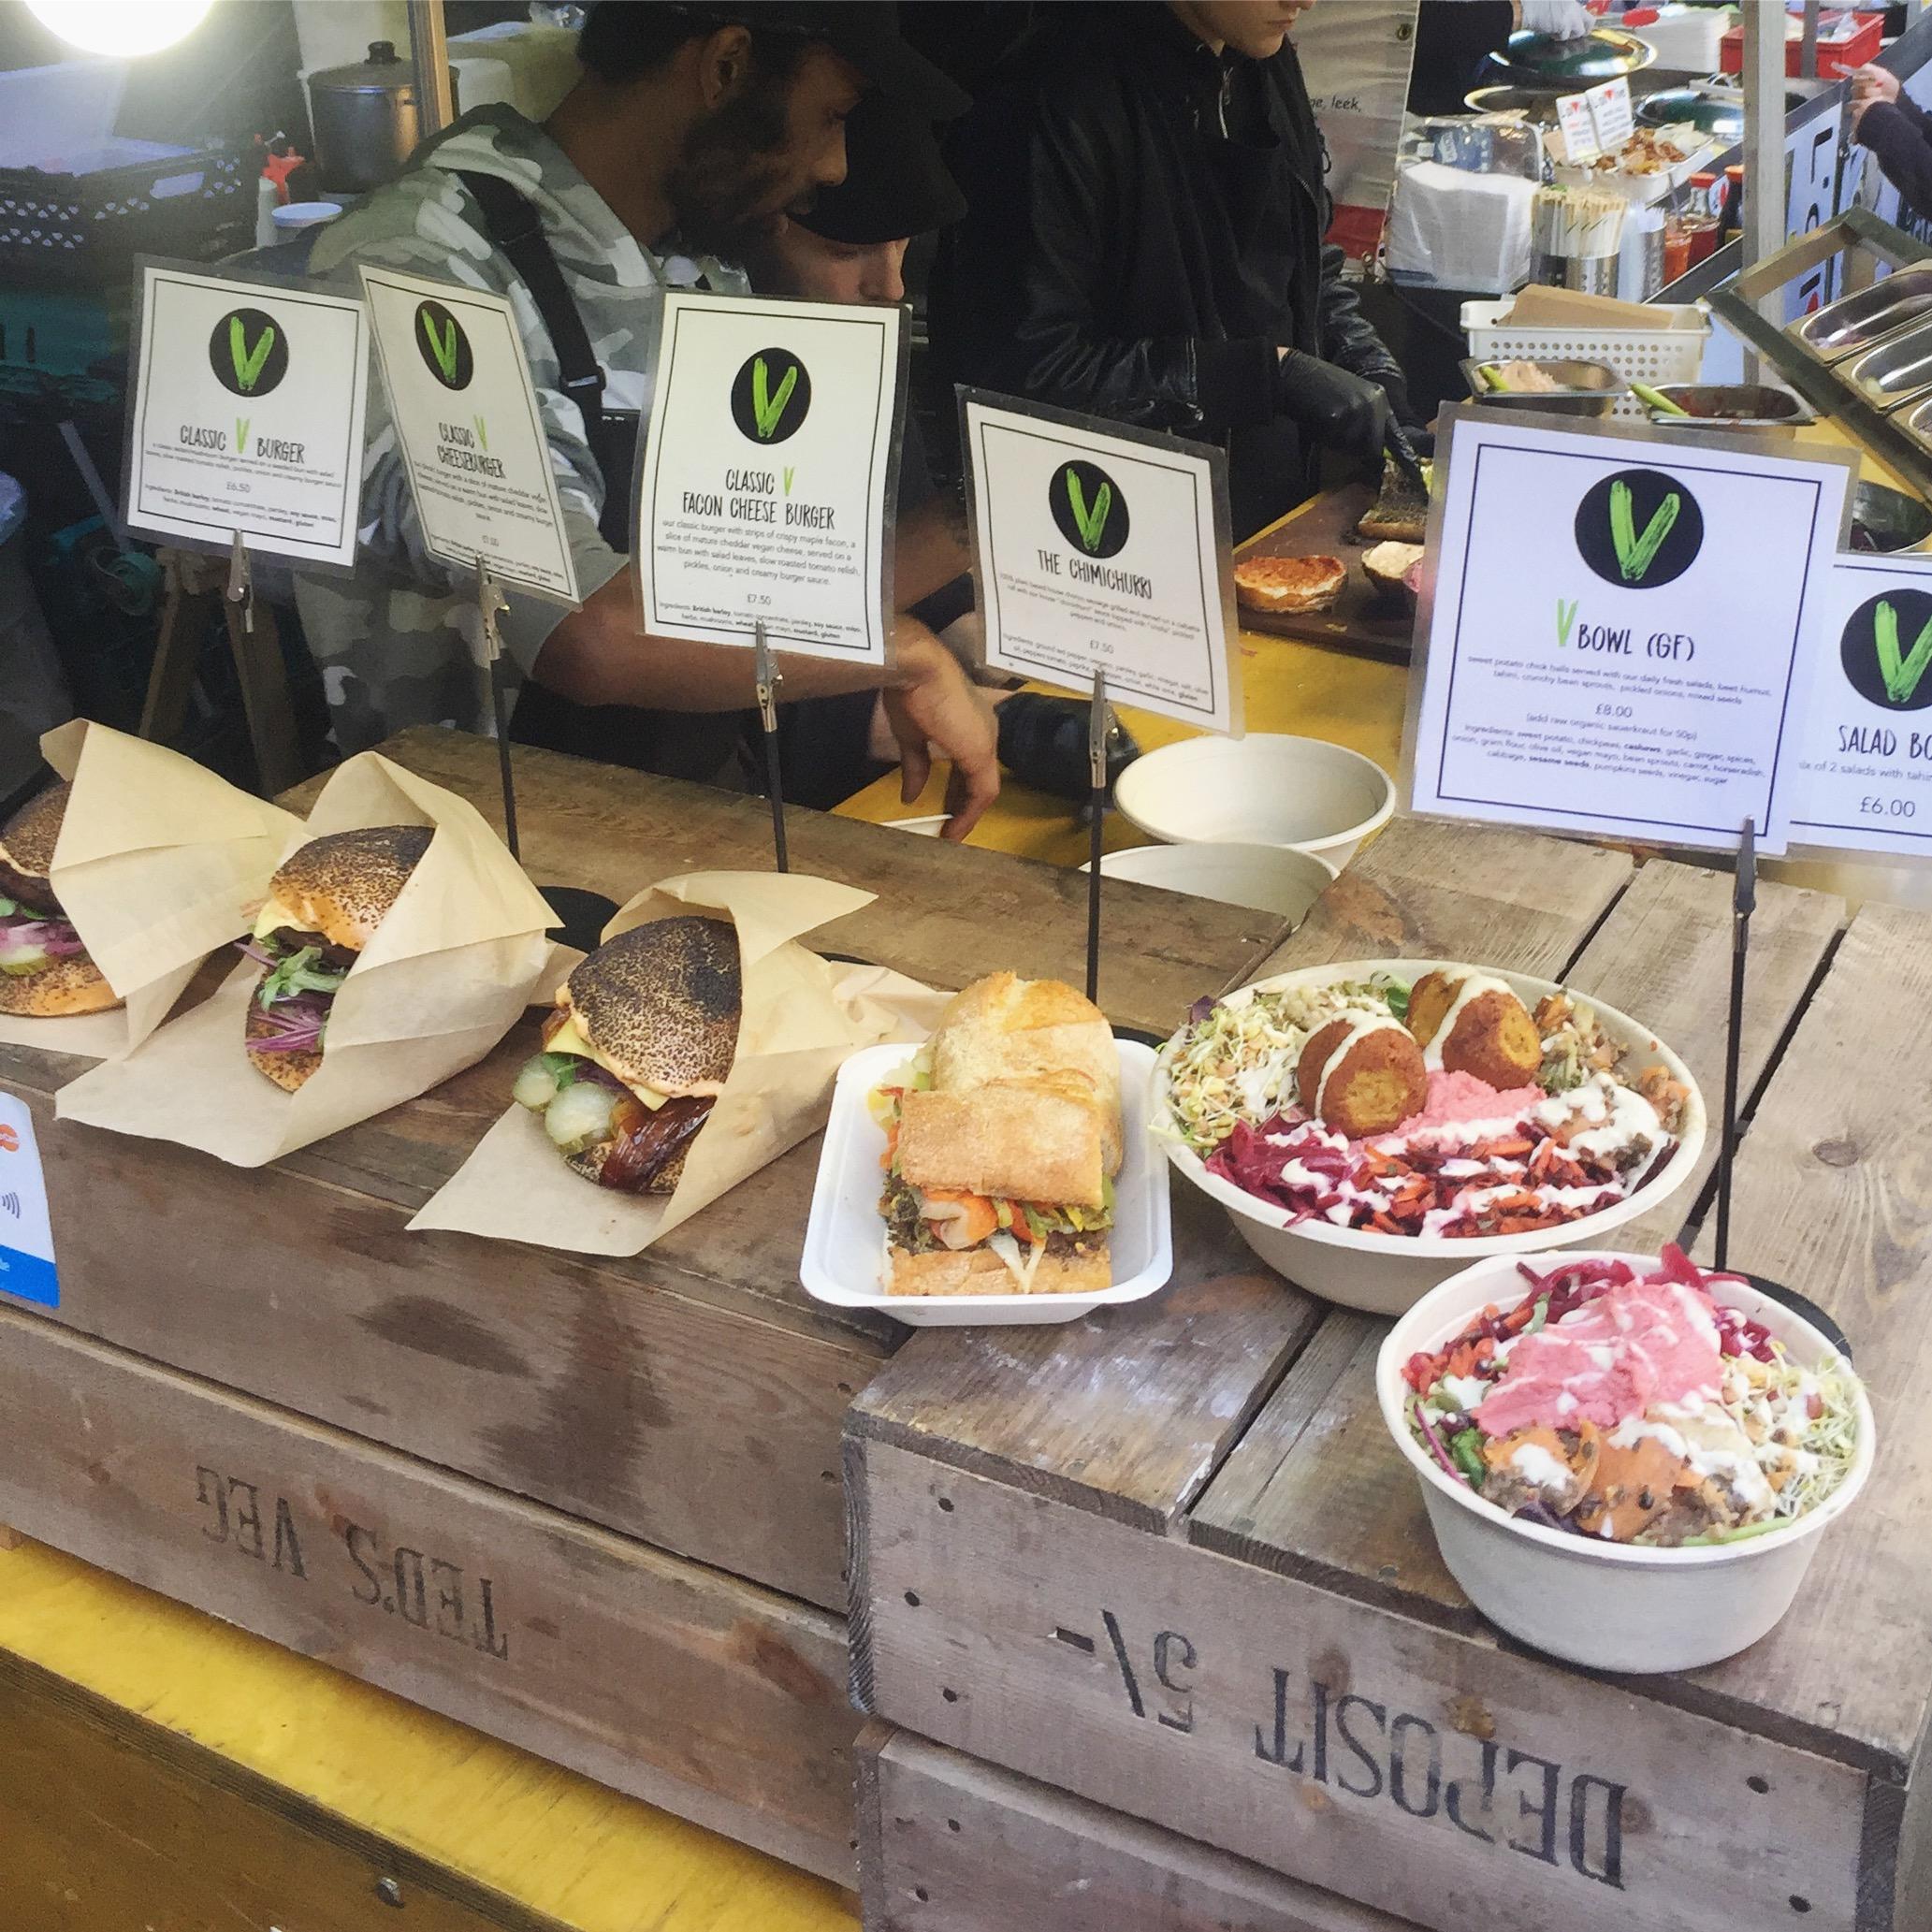 Vegan street food -burgers and hotdogs